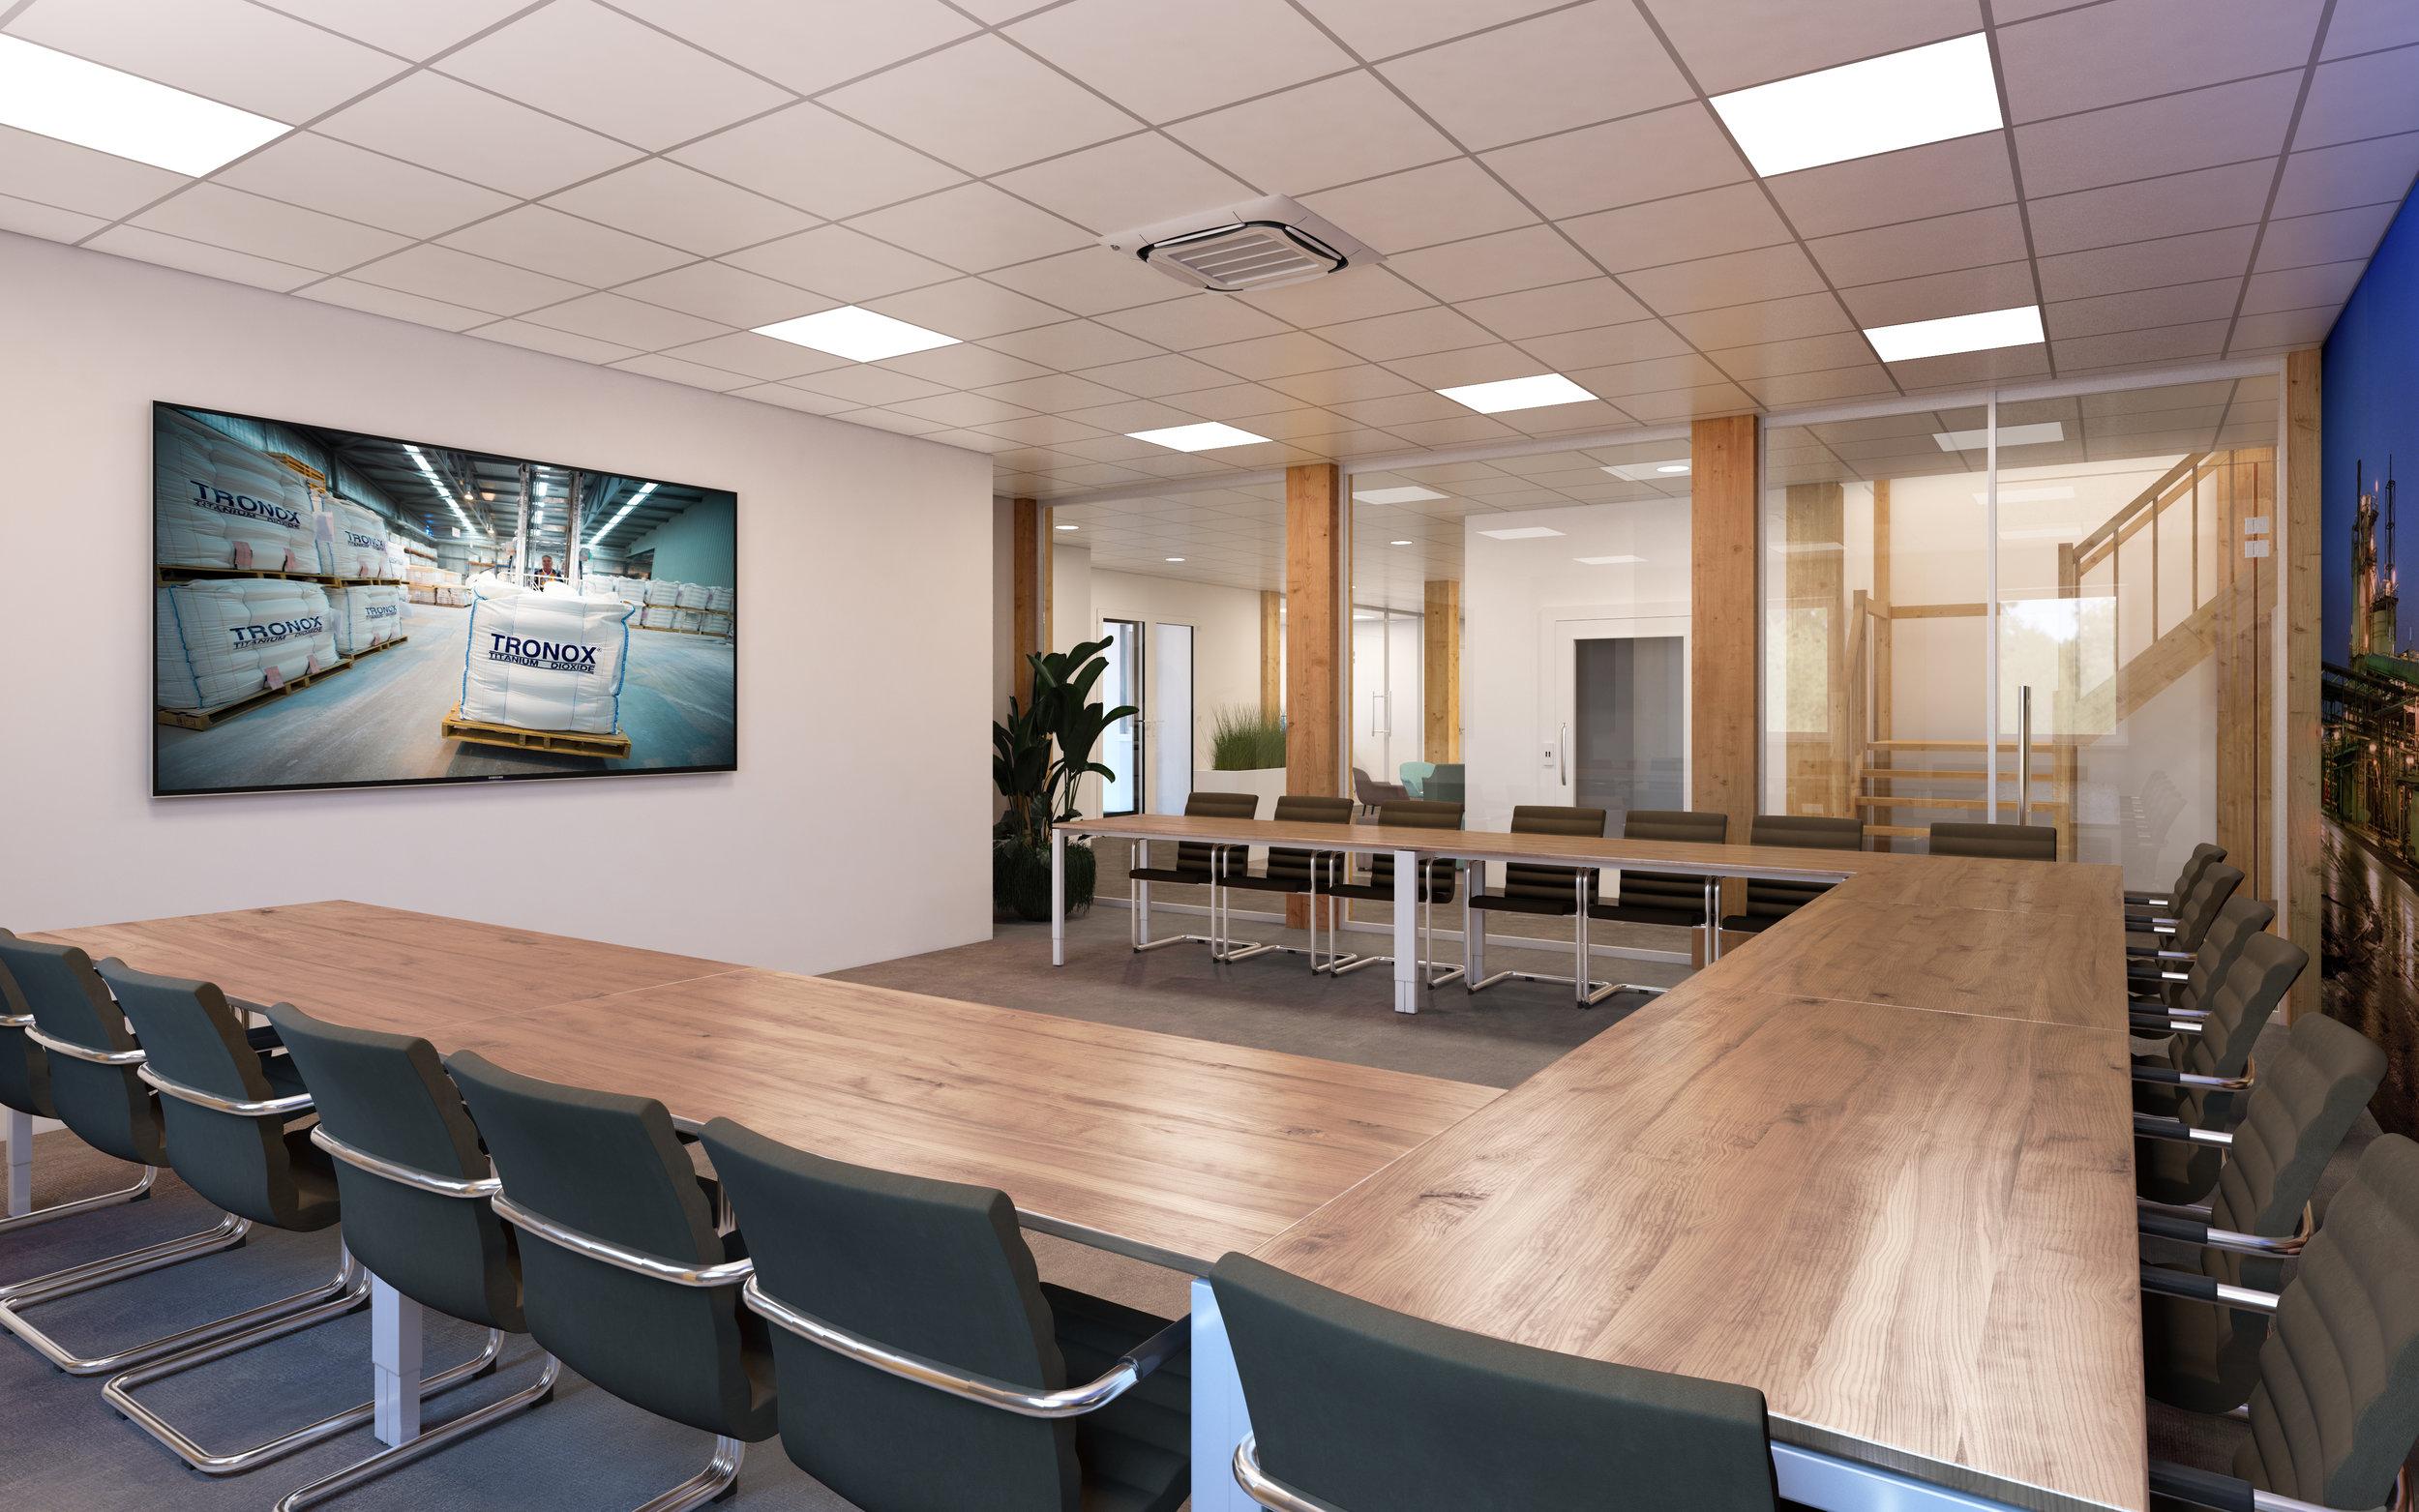 Nieuwbouw kantoor Tronox Botlek Rotterdam 3 VOXS.jpg